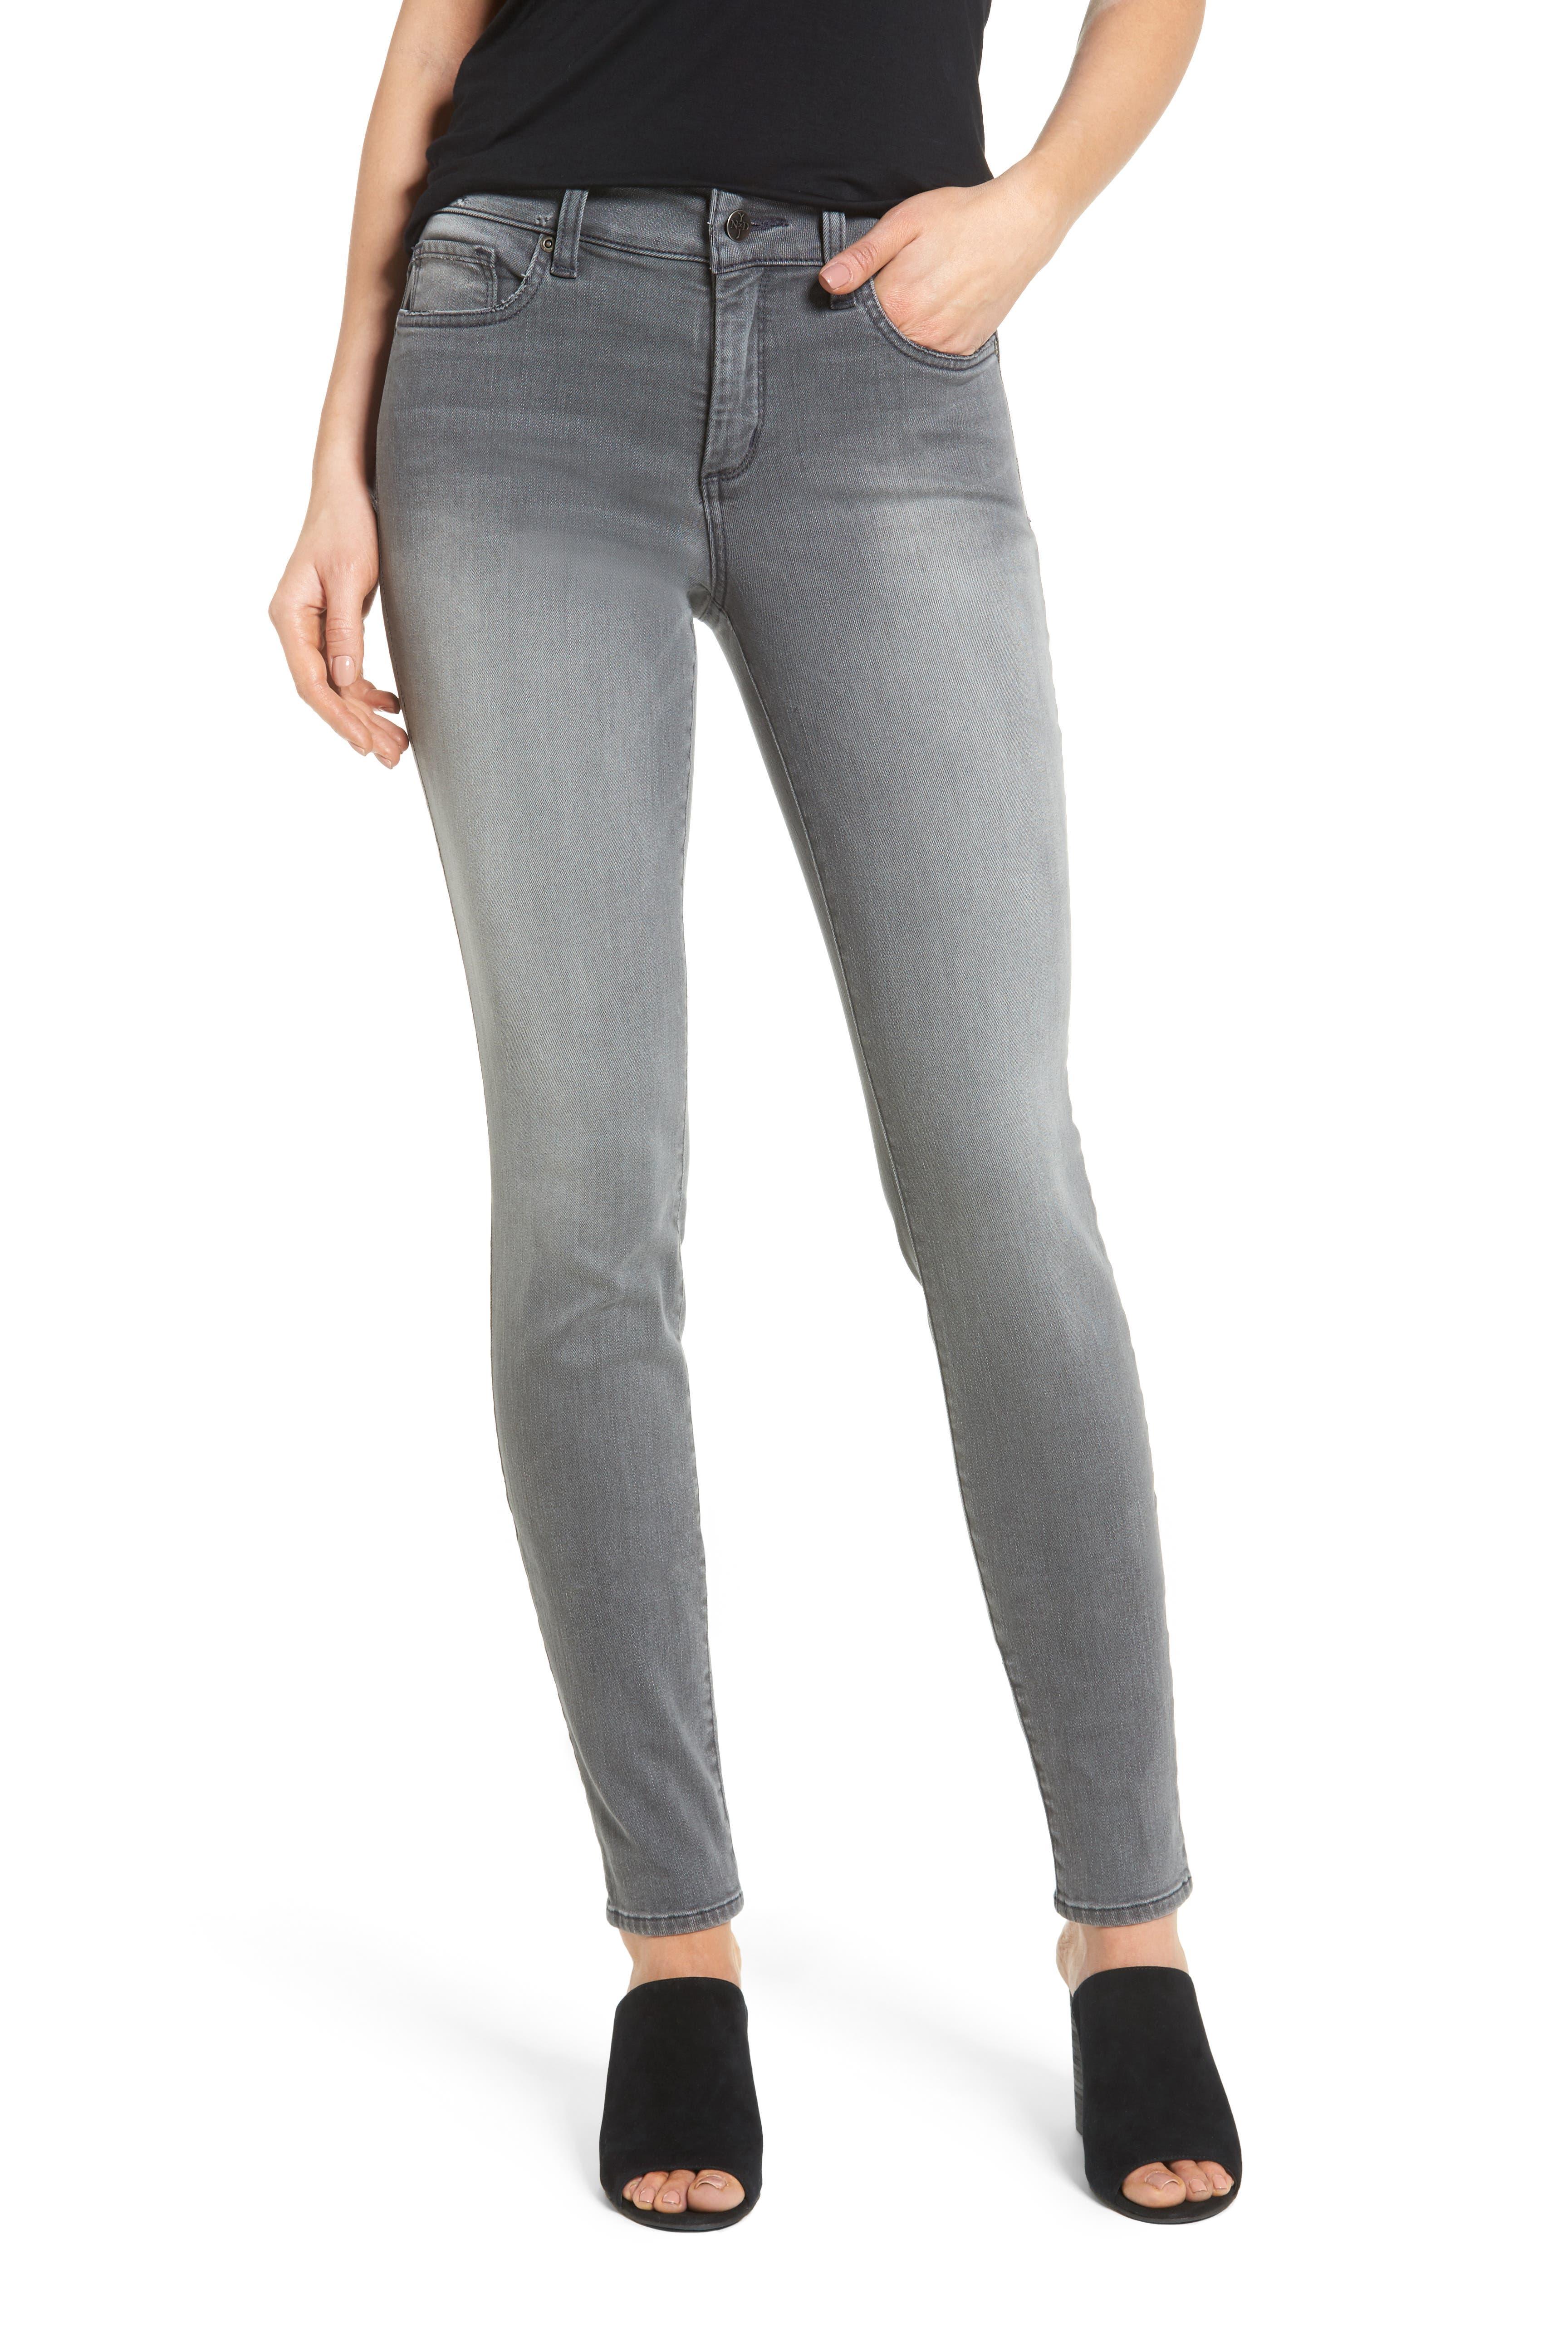 Ami Stretch Skinny Jeans,                         Main,                         color, Alchemy